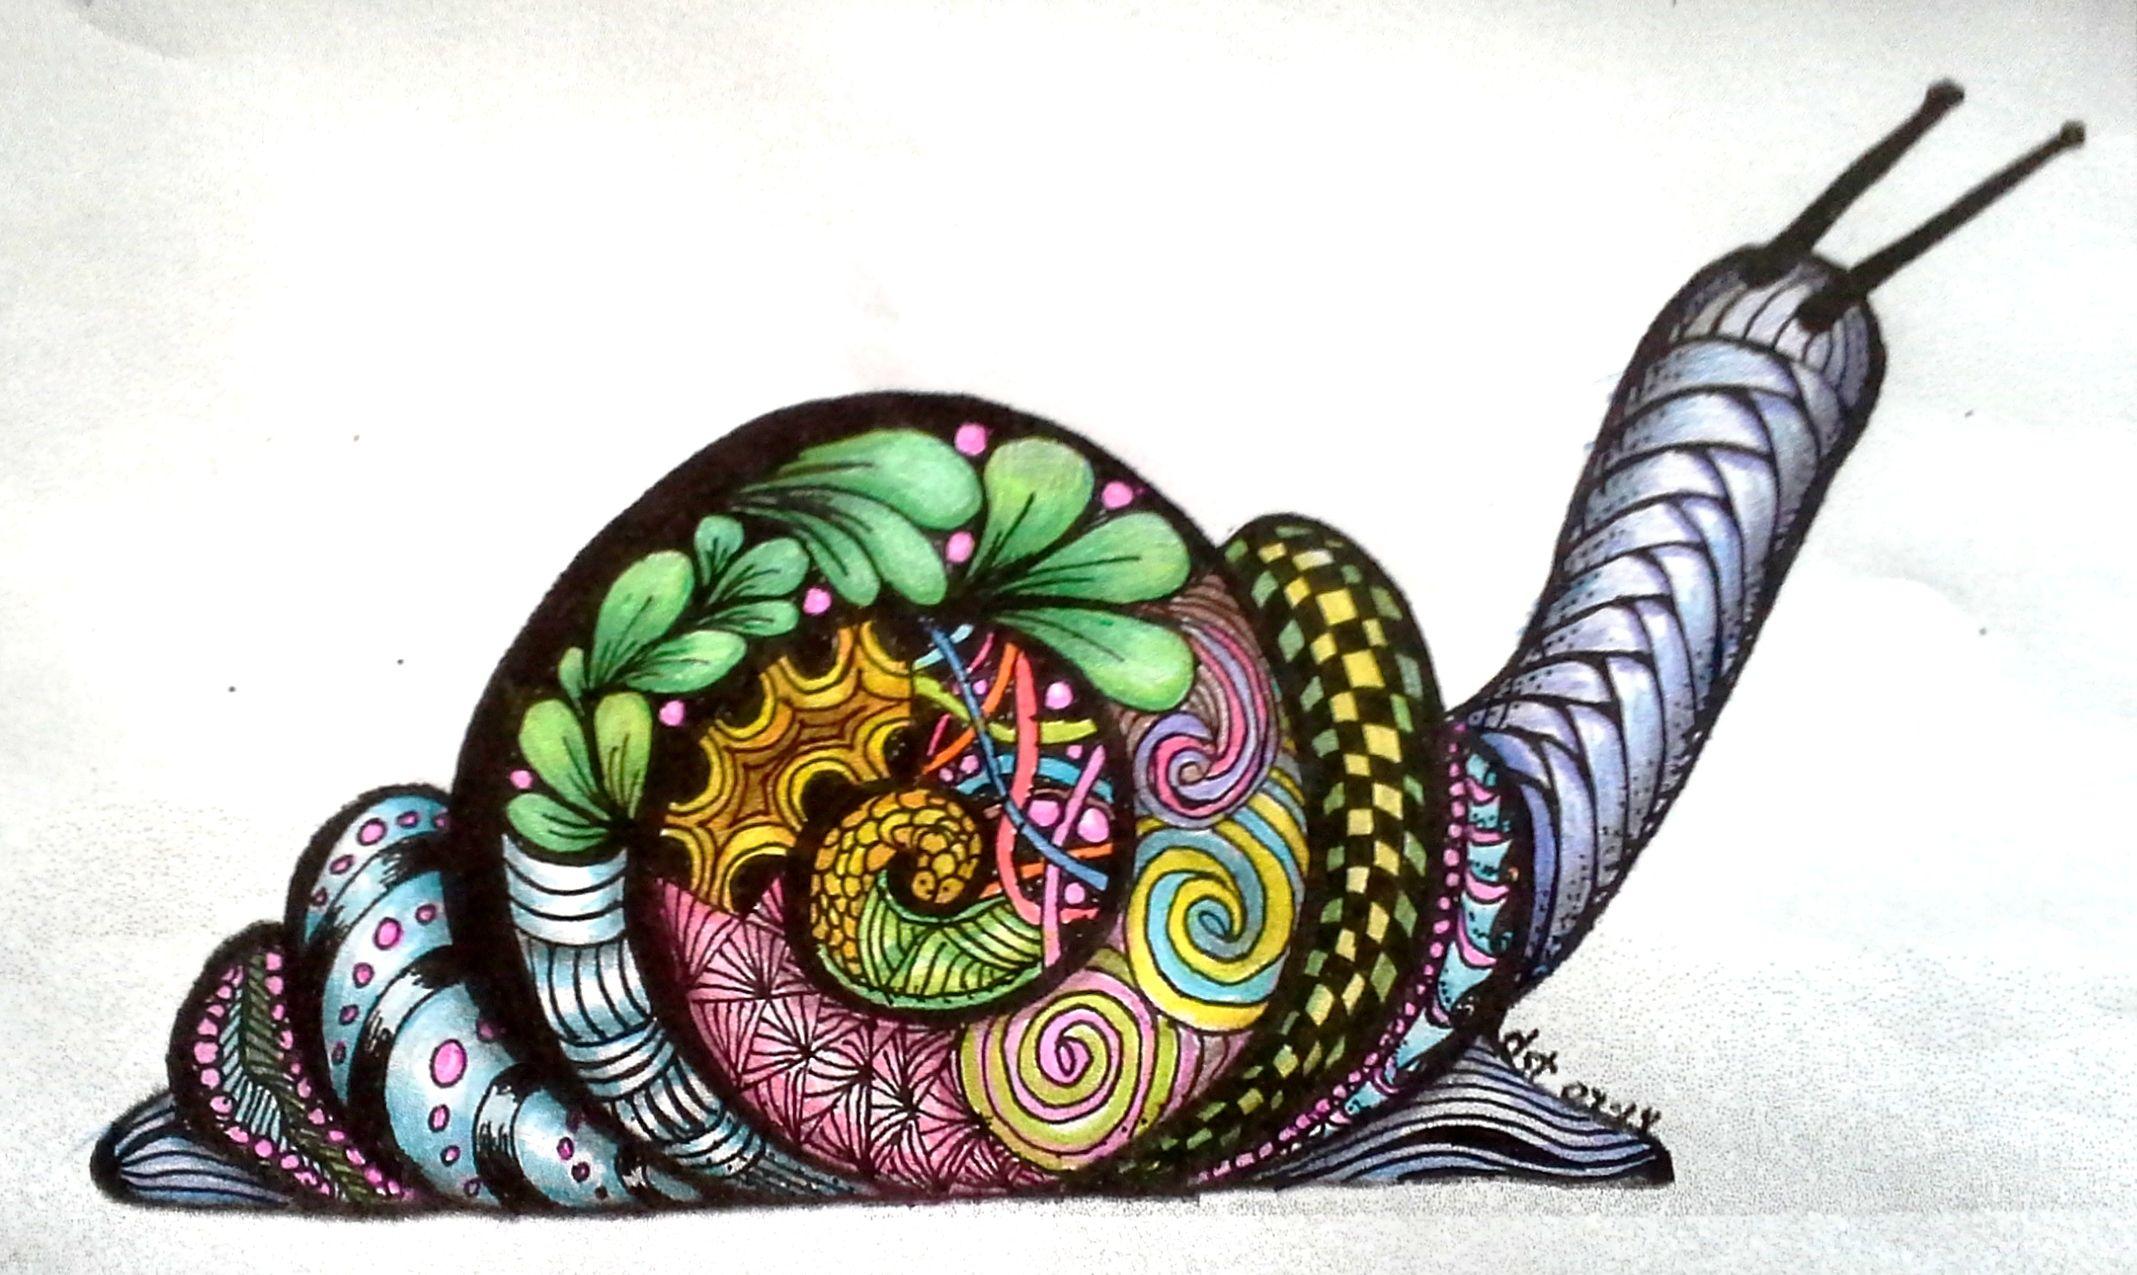 Baby Snail Zentangled & Colored E Z Art zentangle